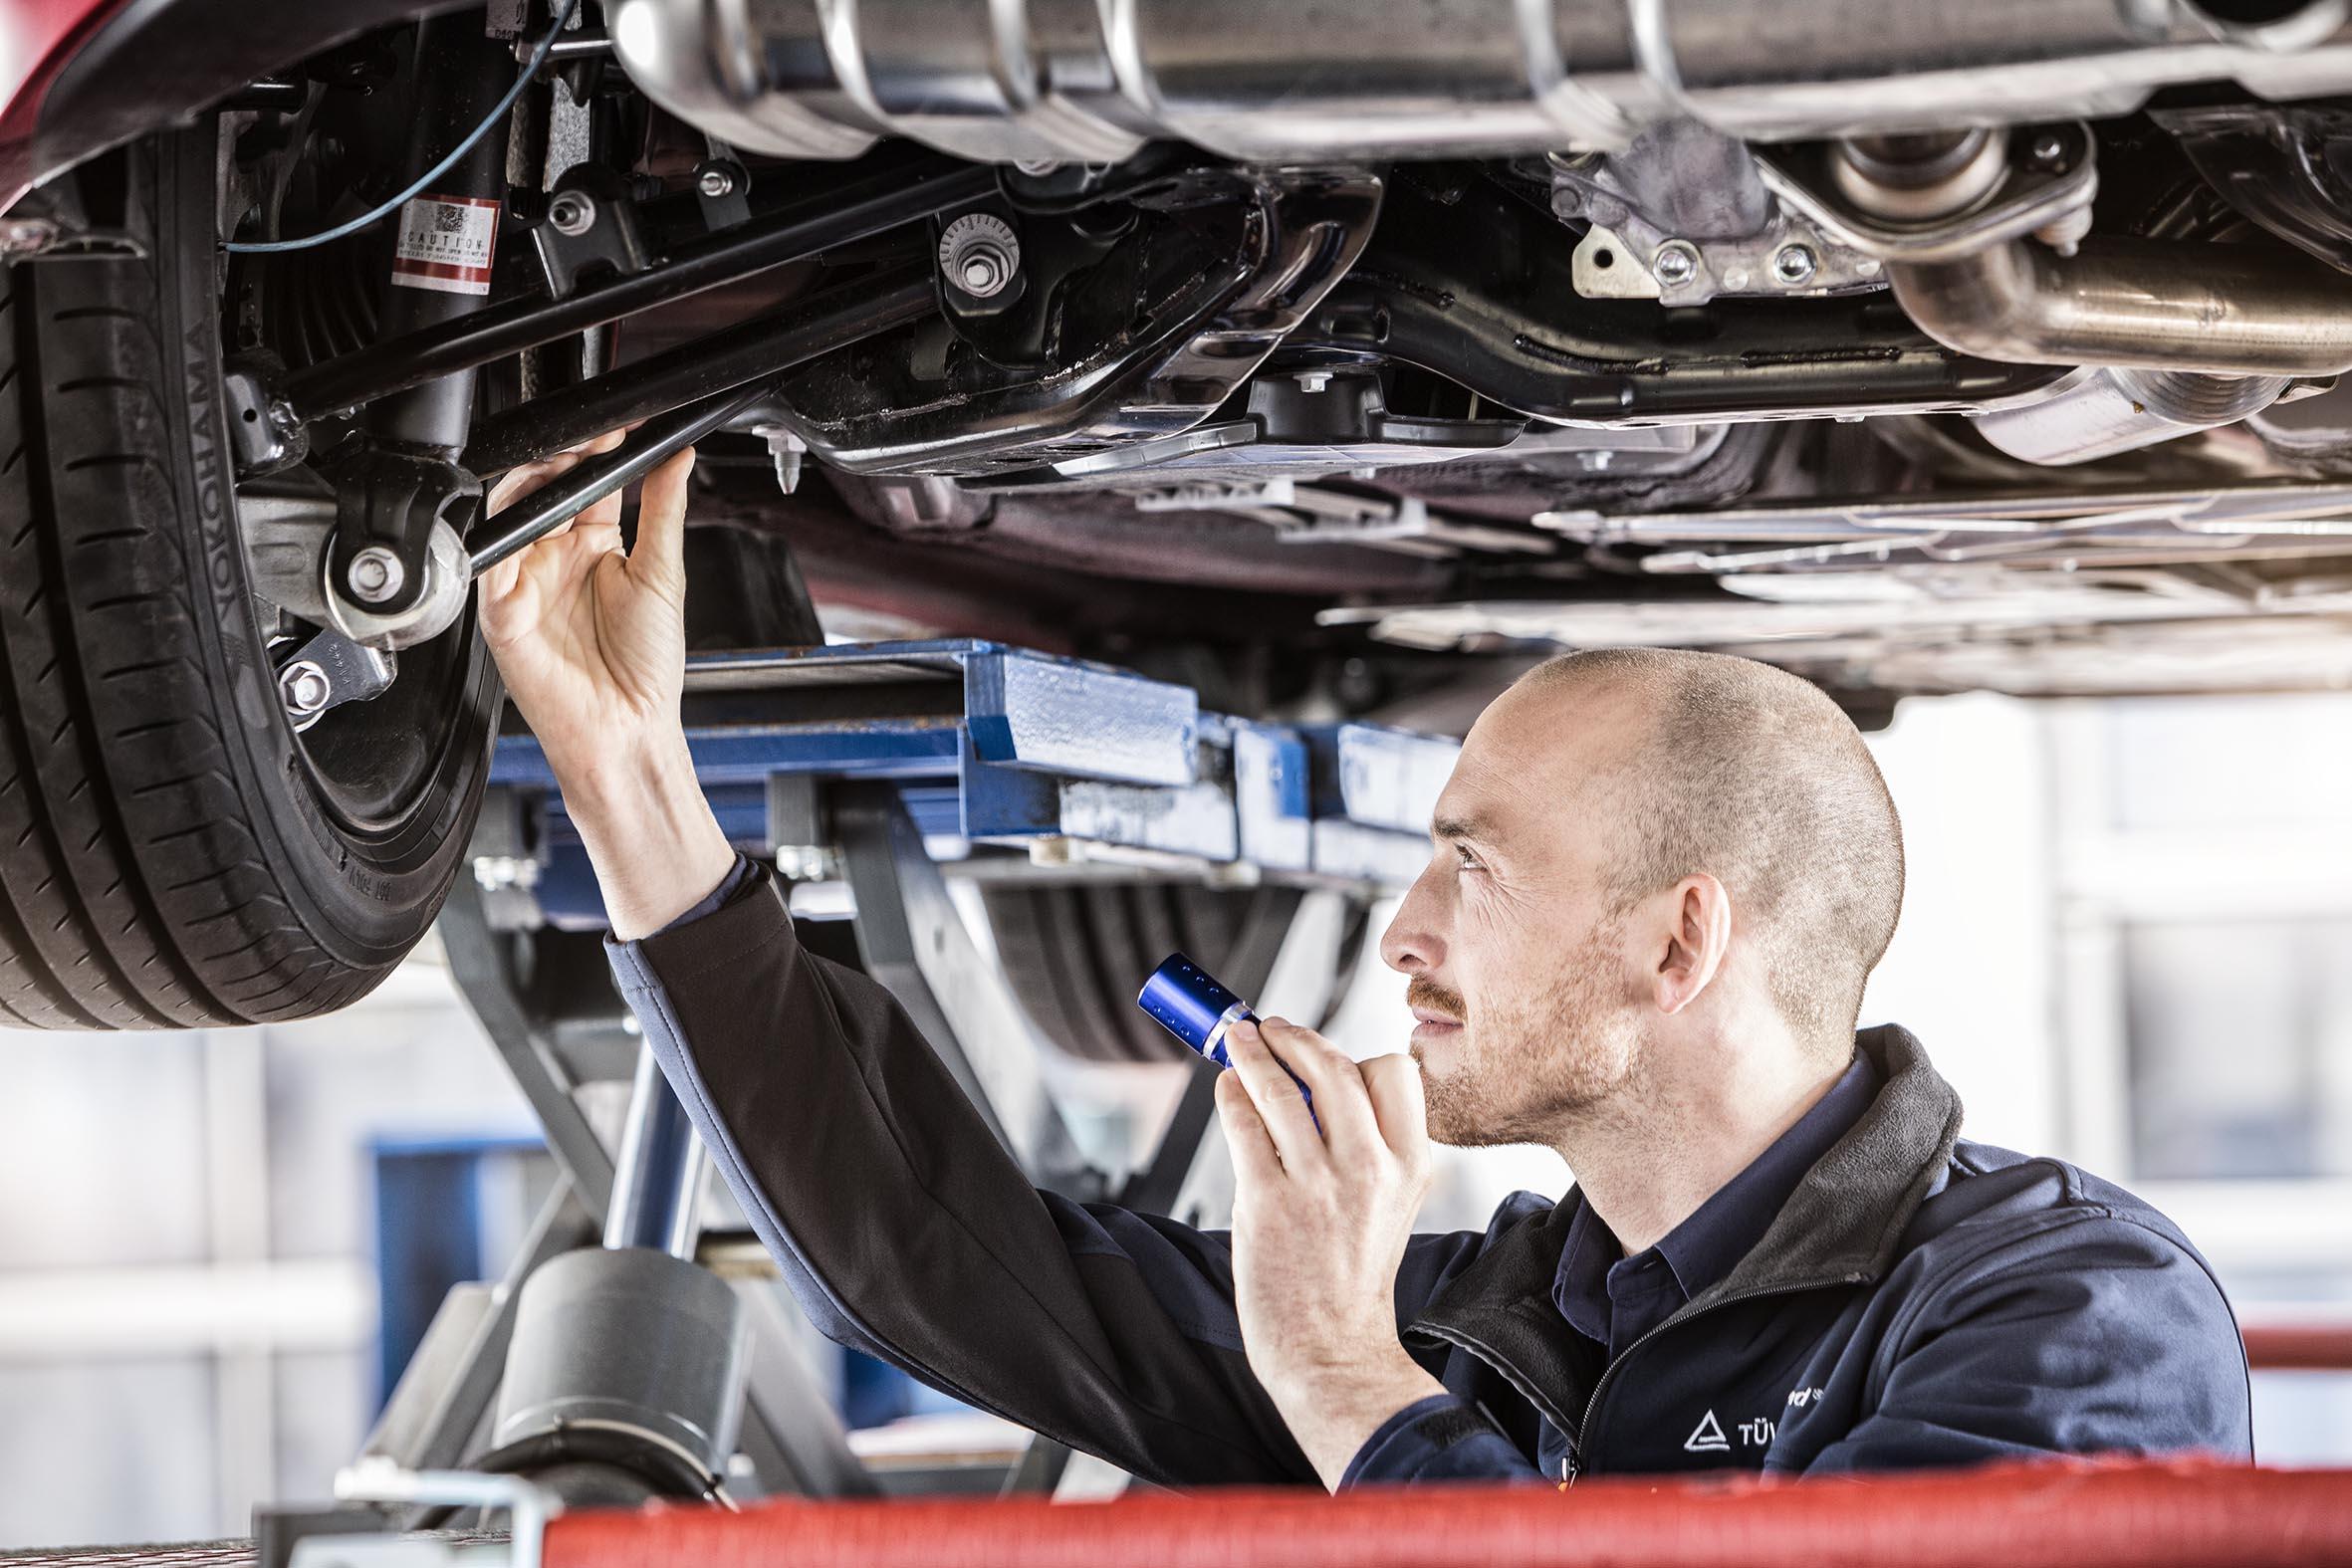 Vehicle Inspection | WO | TÜV Rheinland